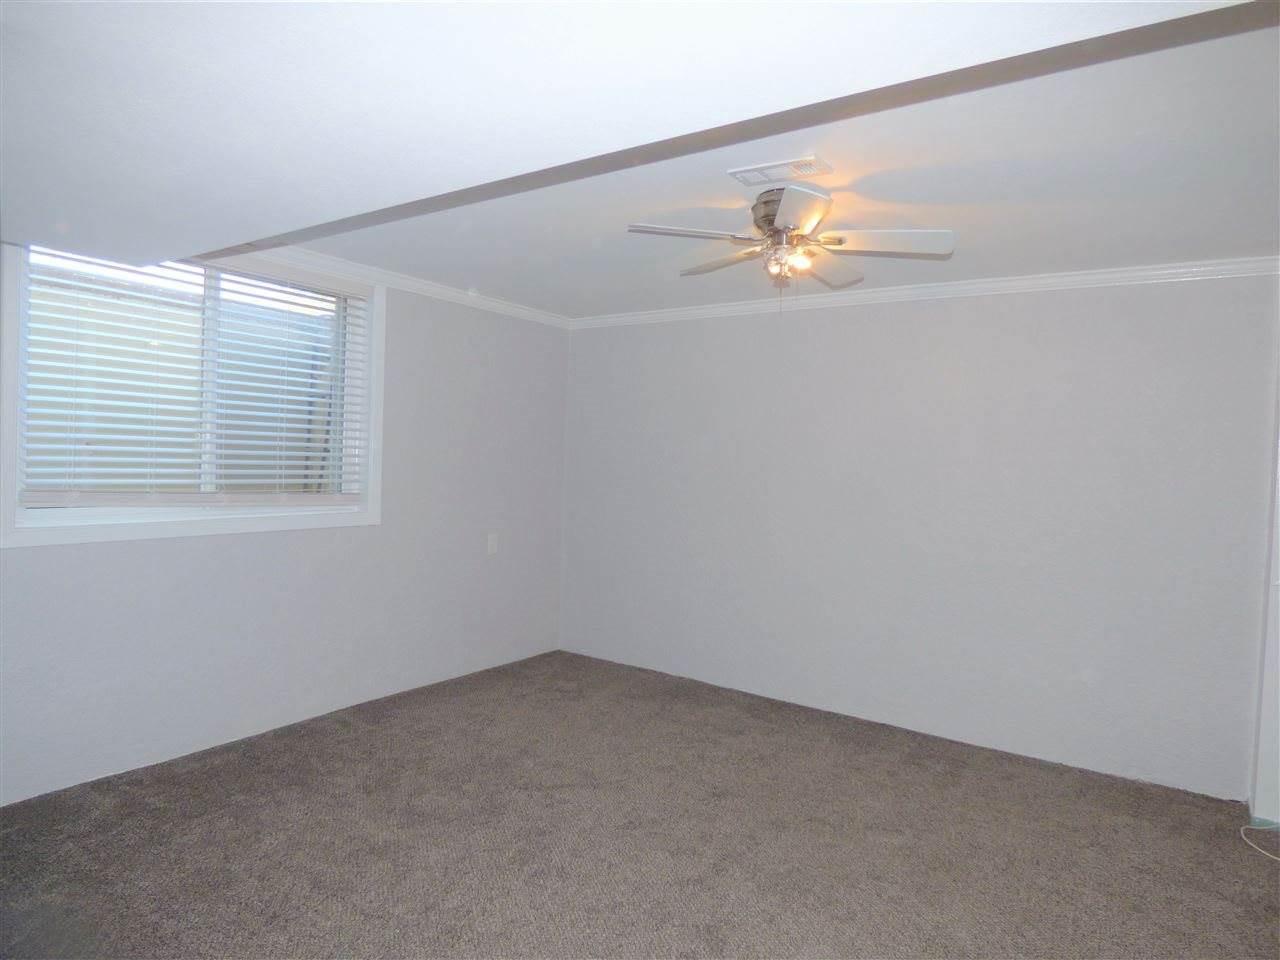 2451 N Rutland Ct, Wichita, KS 67226